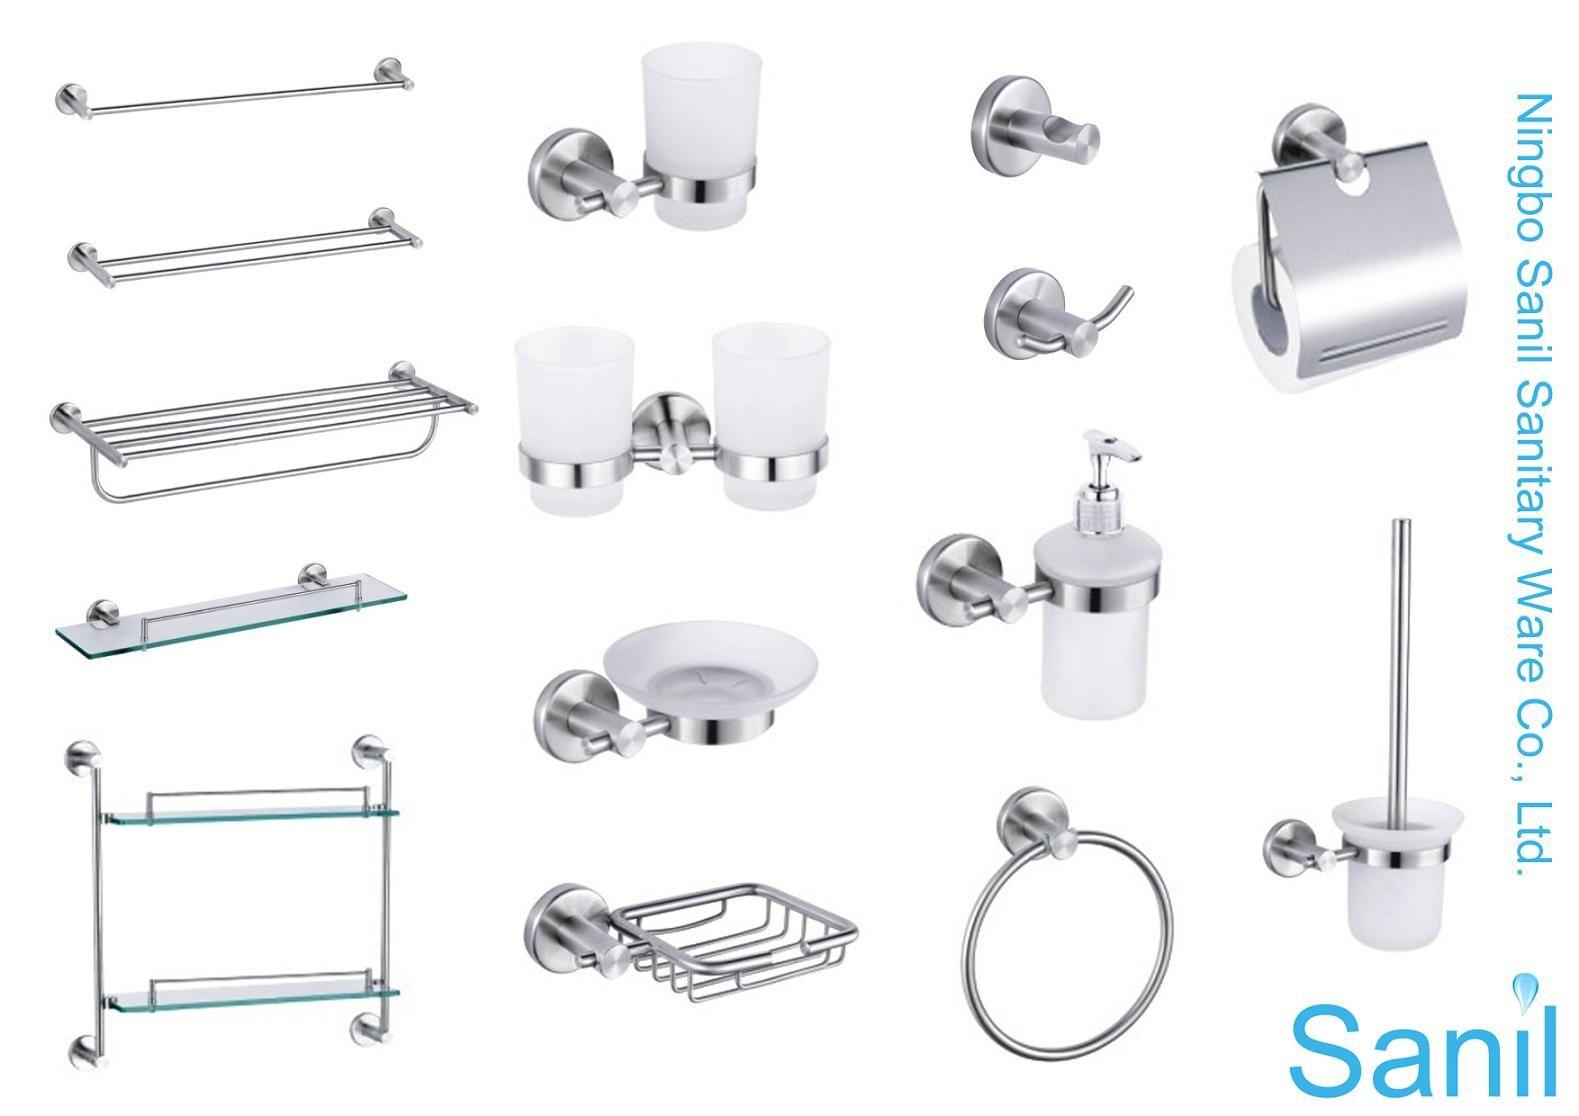 bathroom accessories installation guide | ideas | Pinterest ...